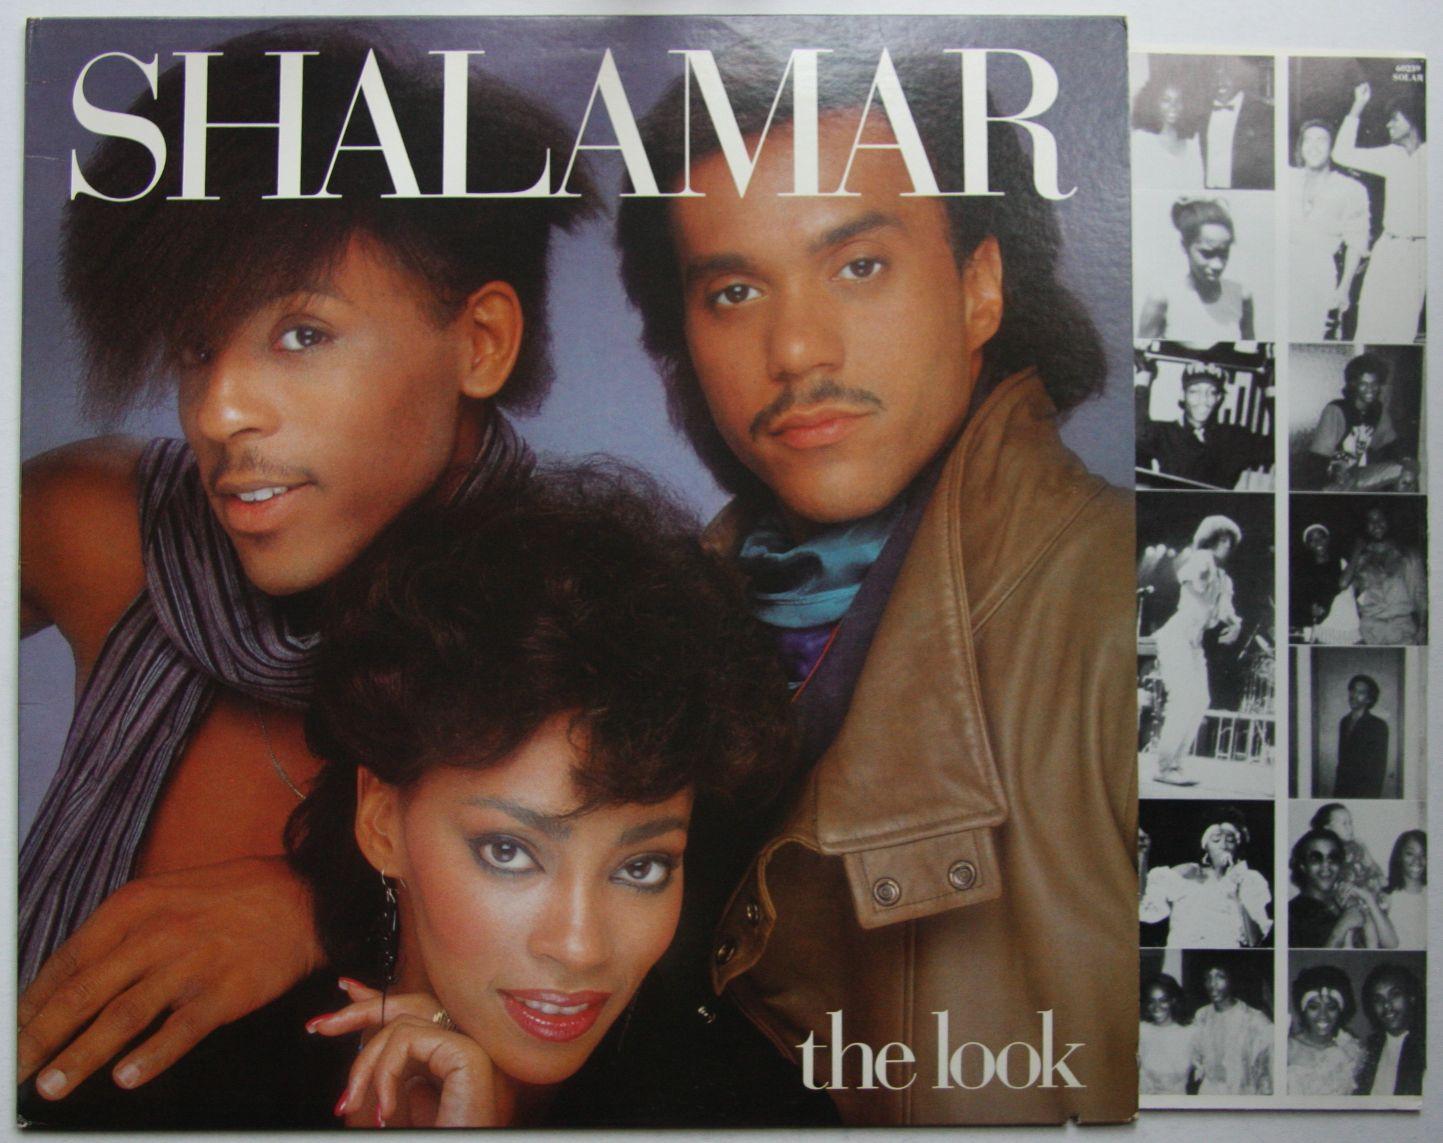 Shalamar Album Covers